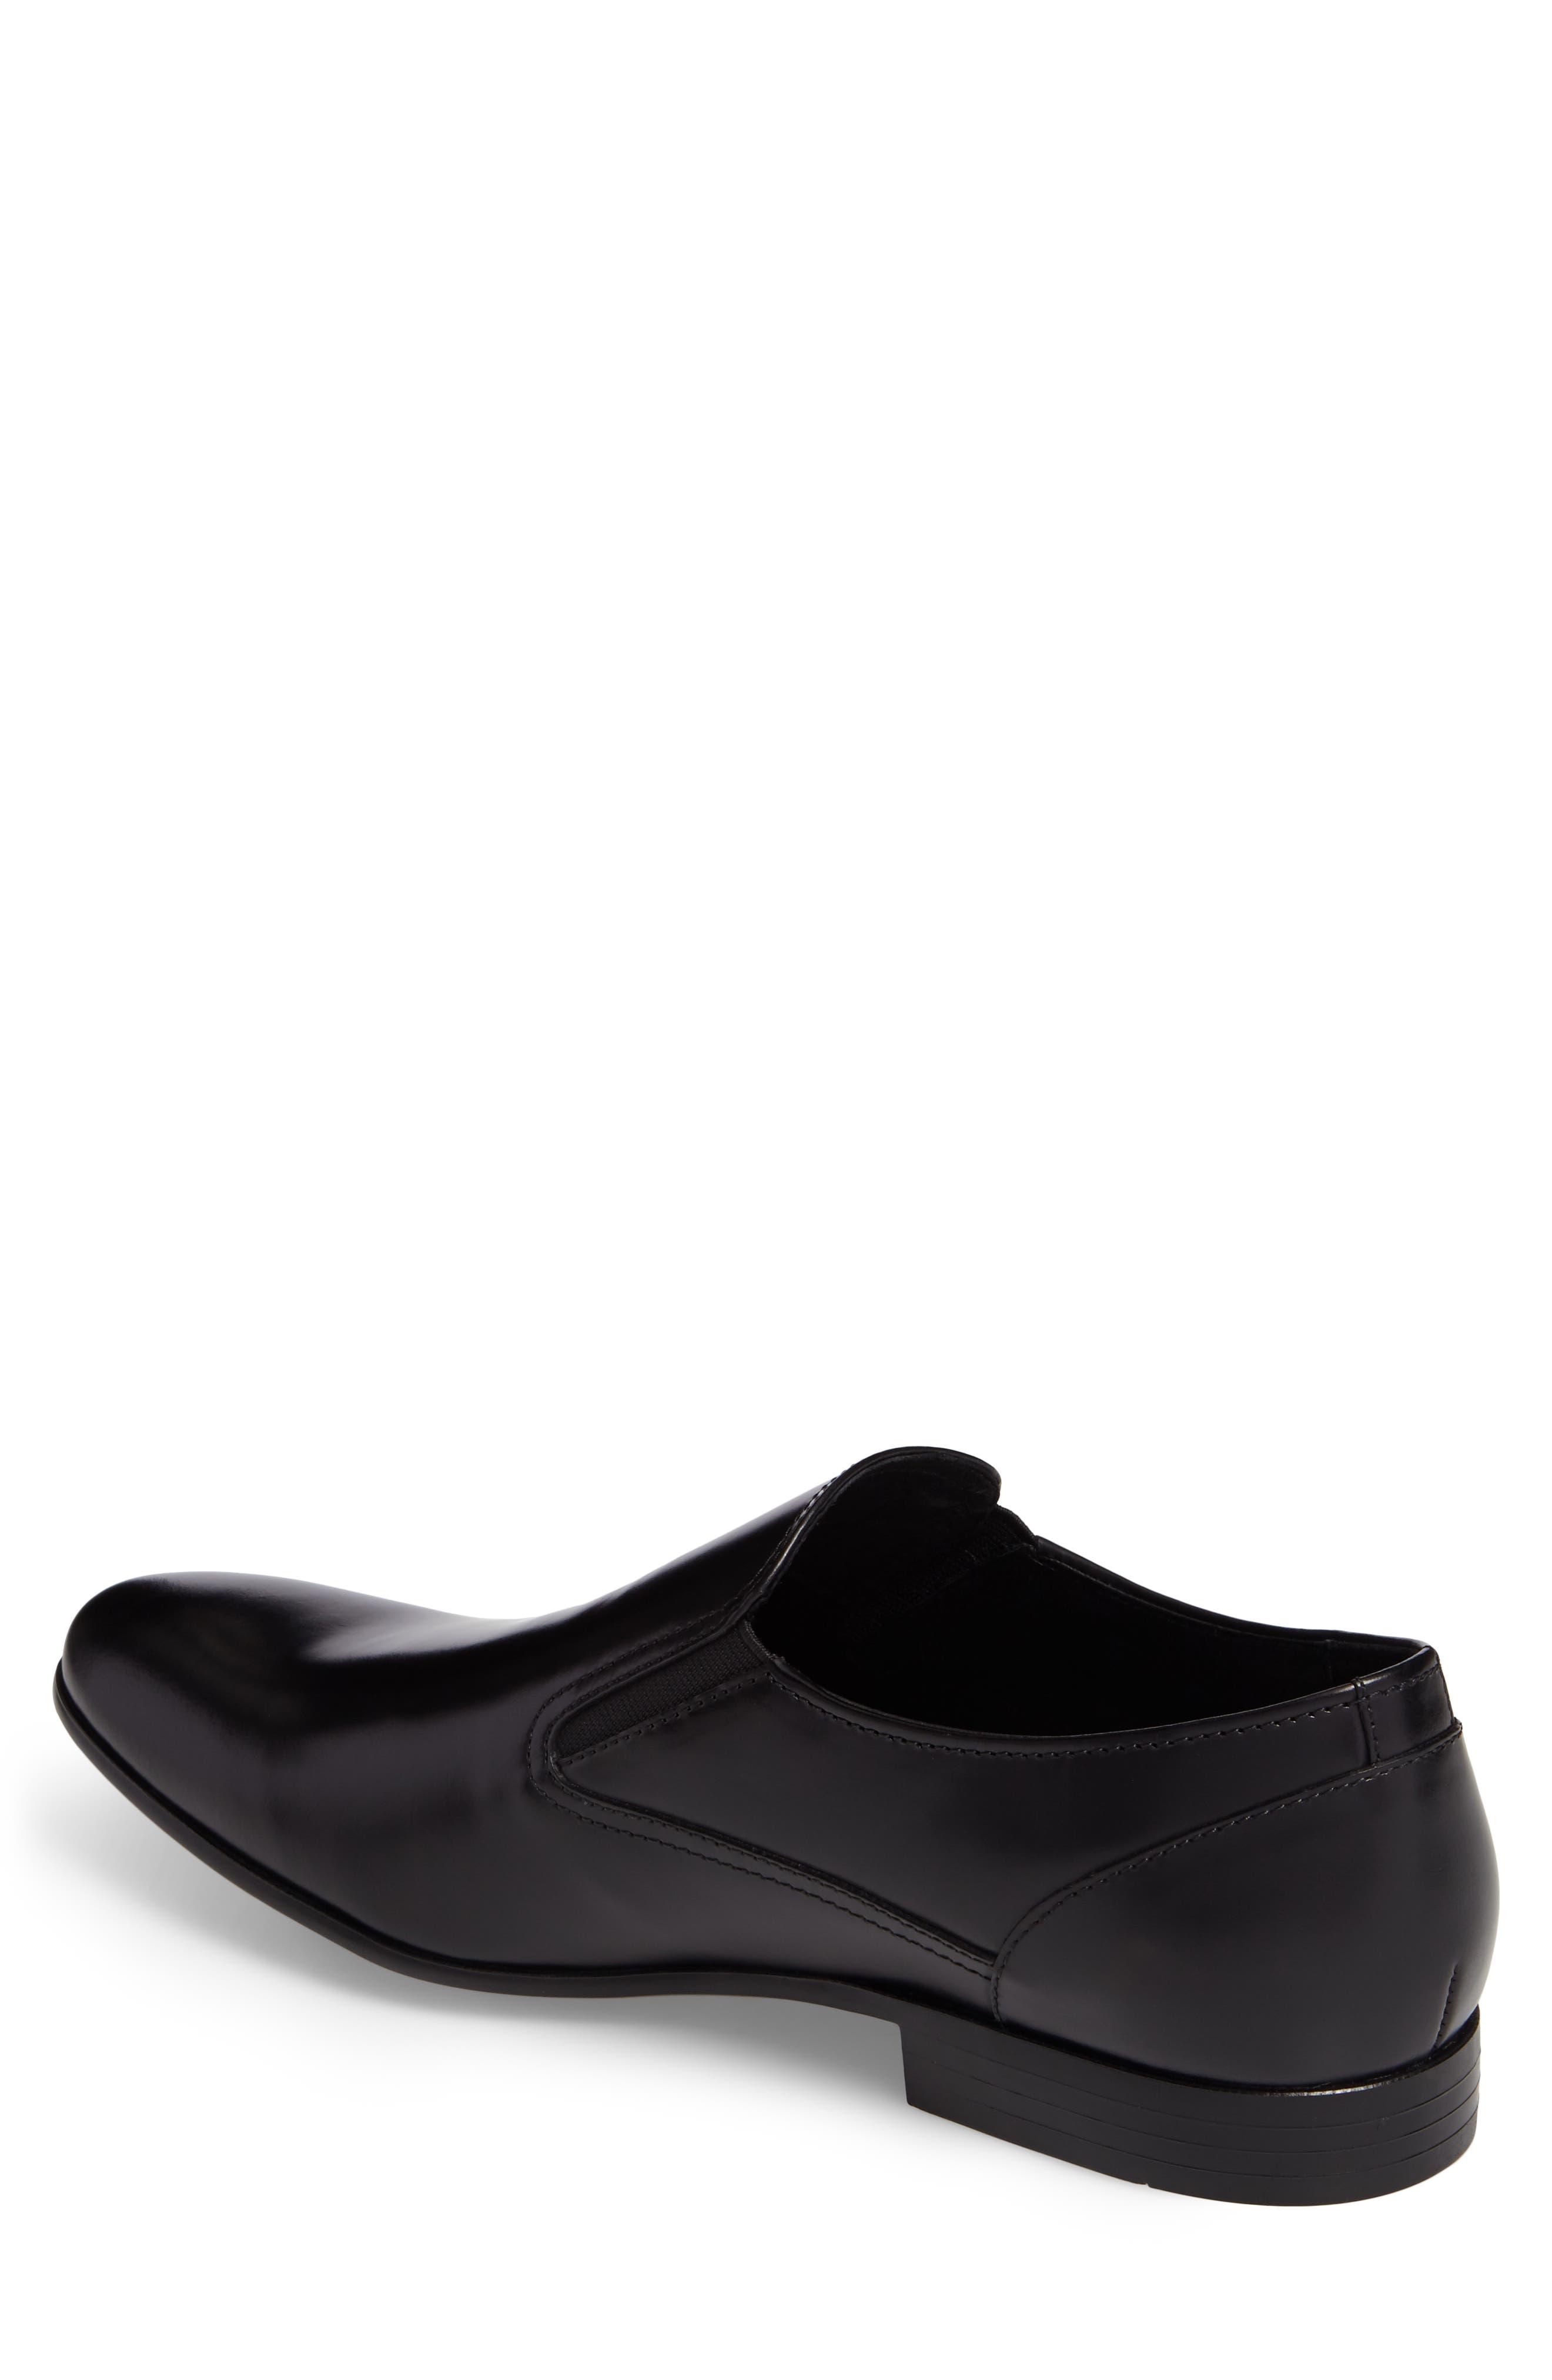 Venetian Loafer,                             Alternate thumbnail 2, color,                             Black Leather